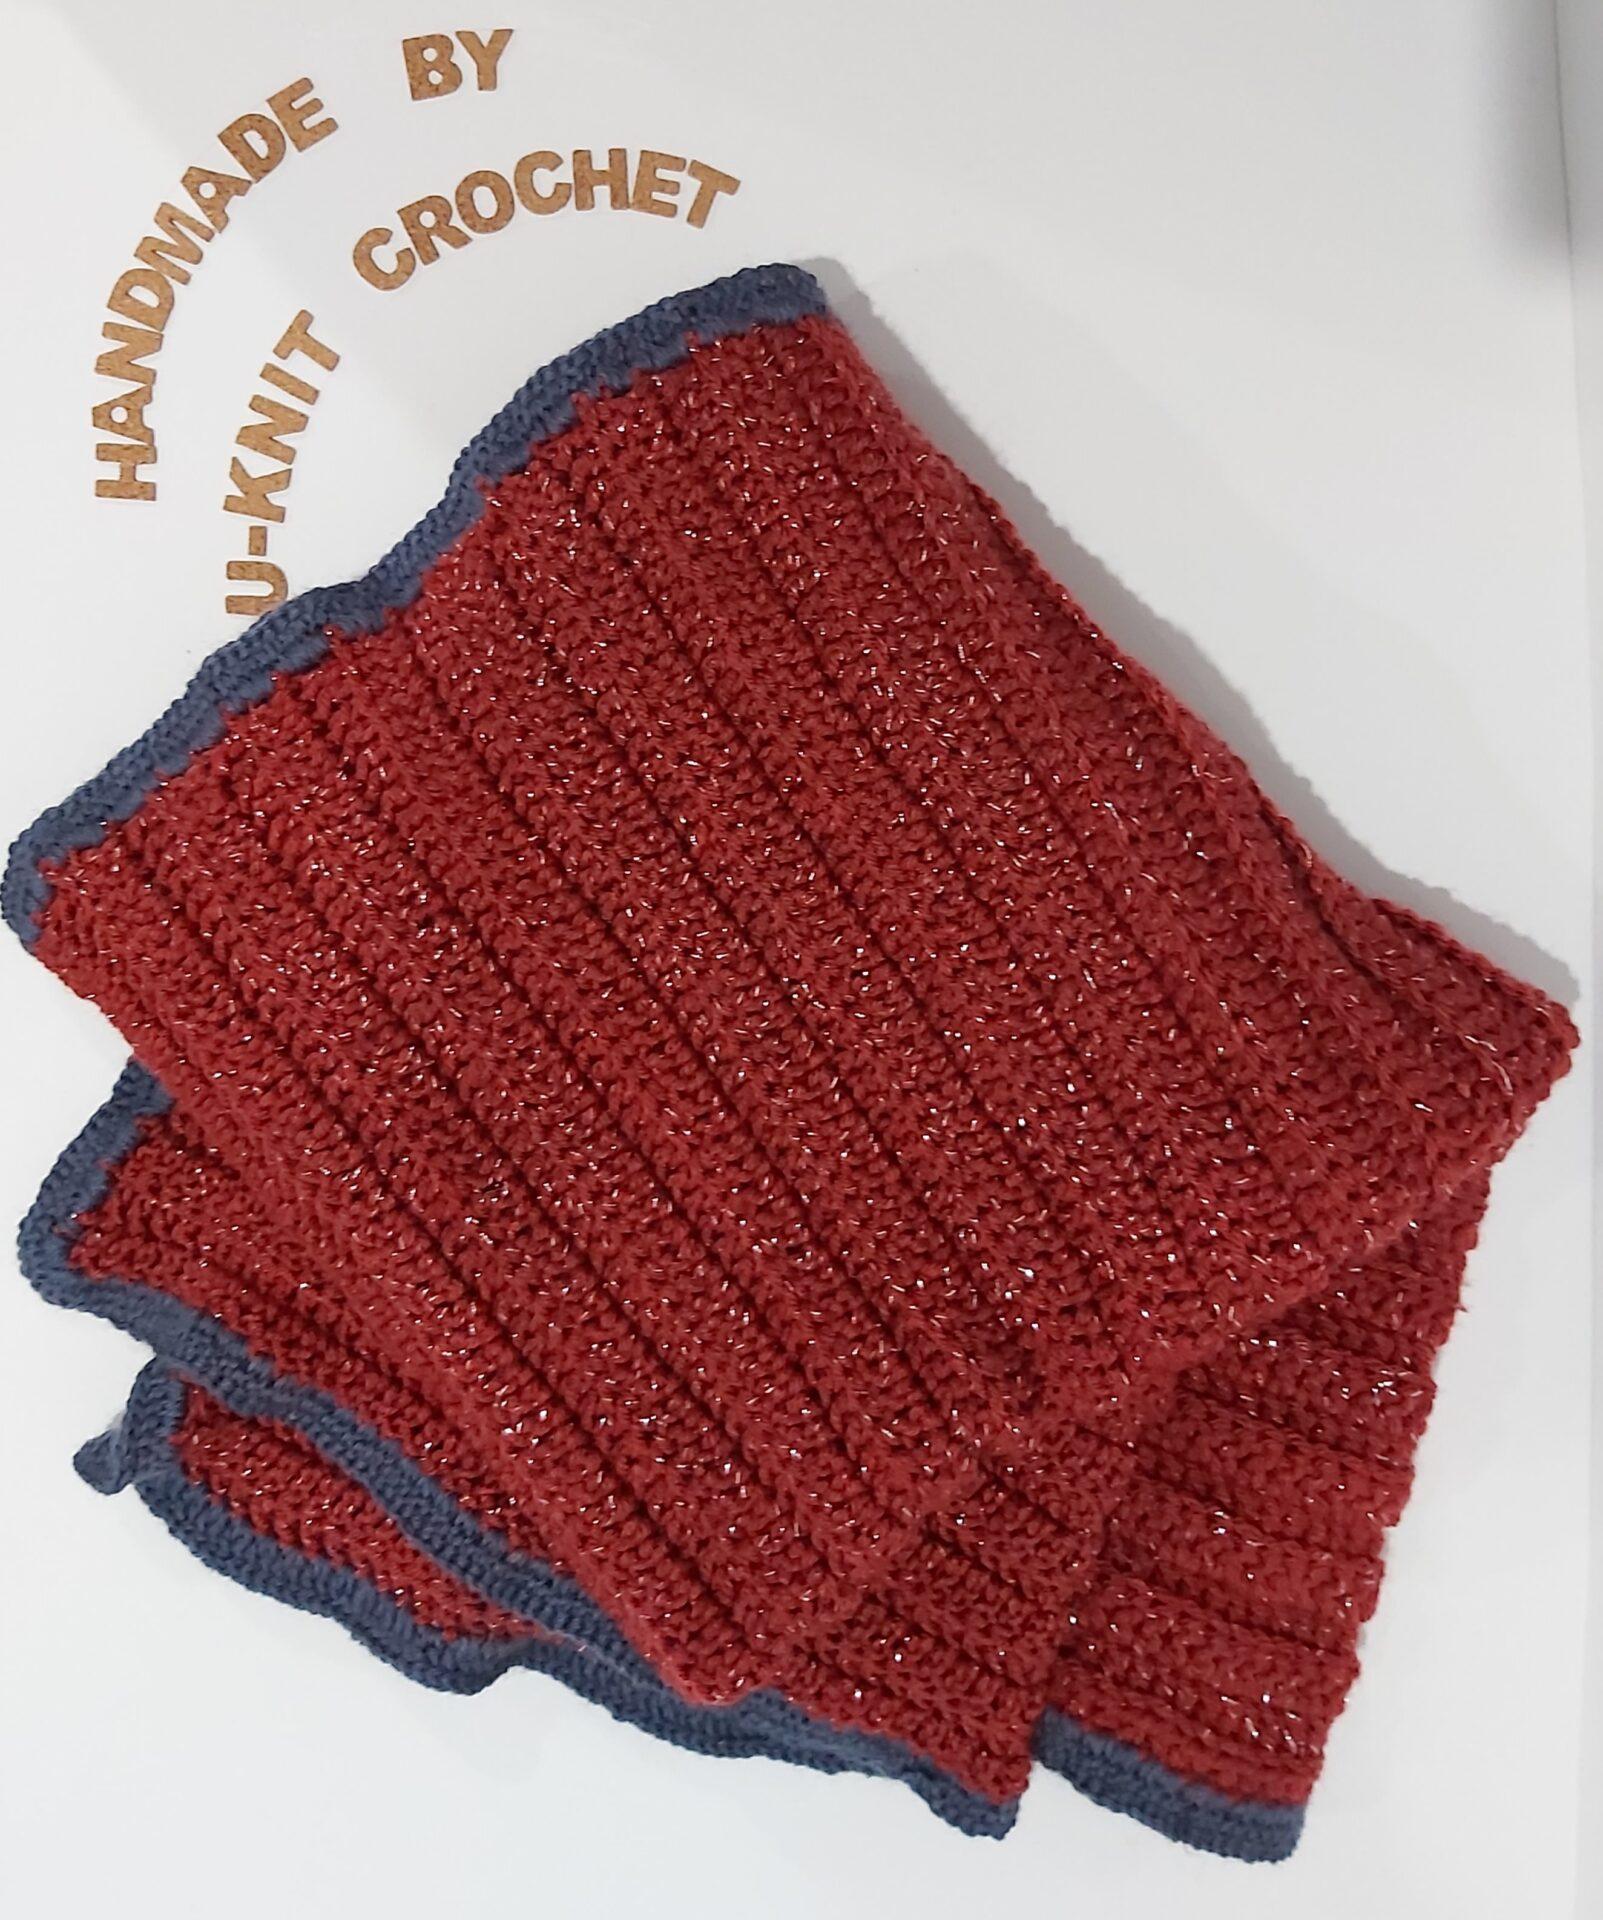 Coral Lap Blanket Handmade By U-Knit Crochet